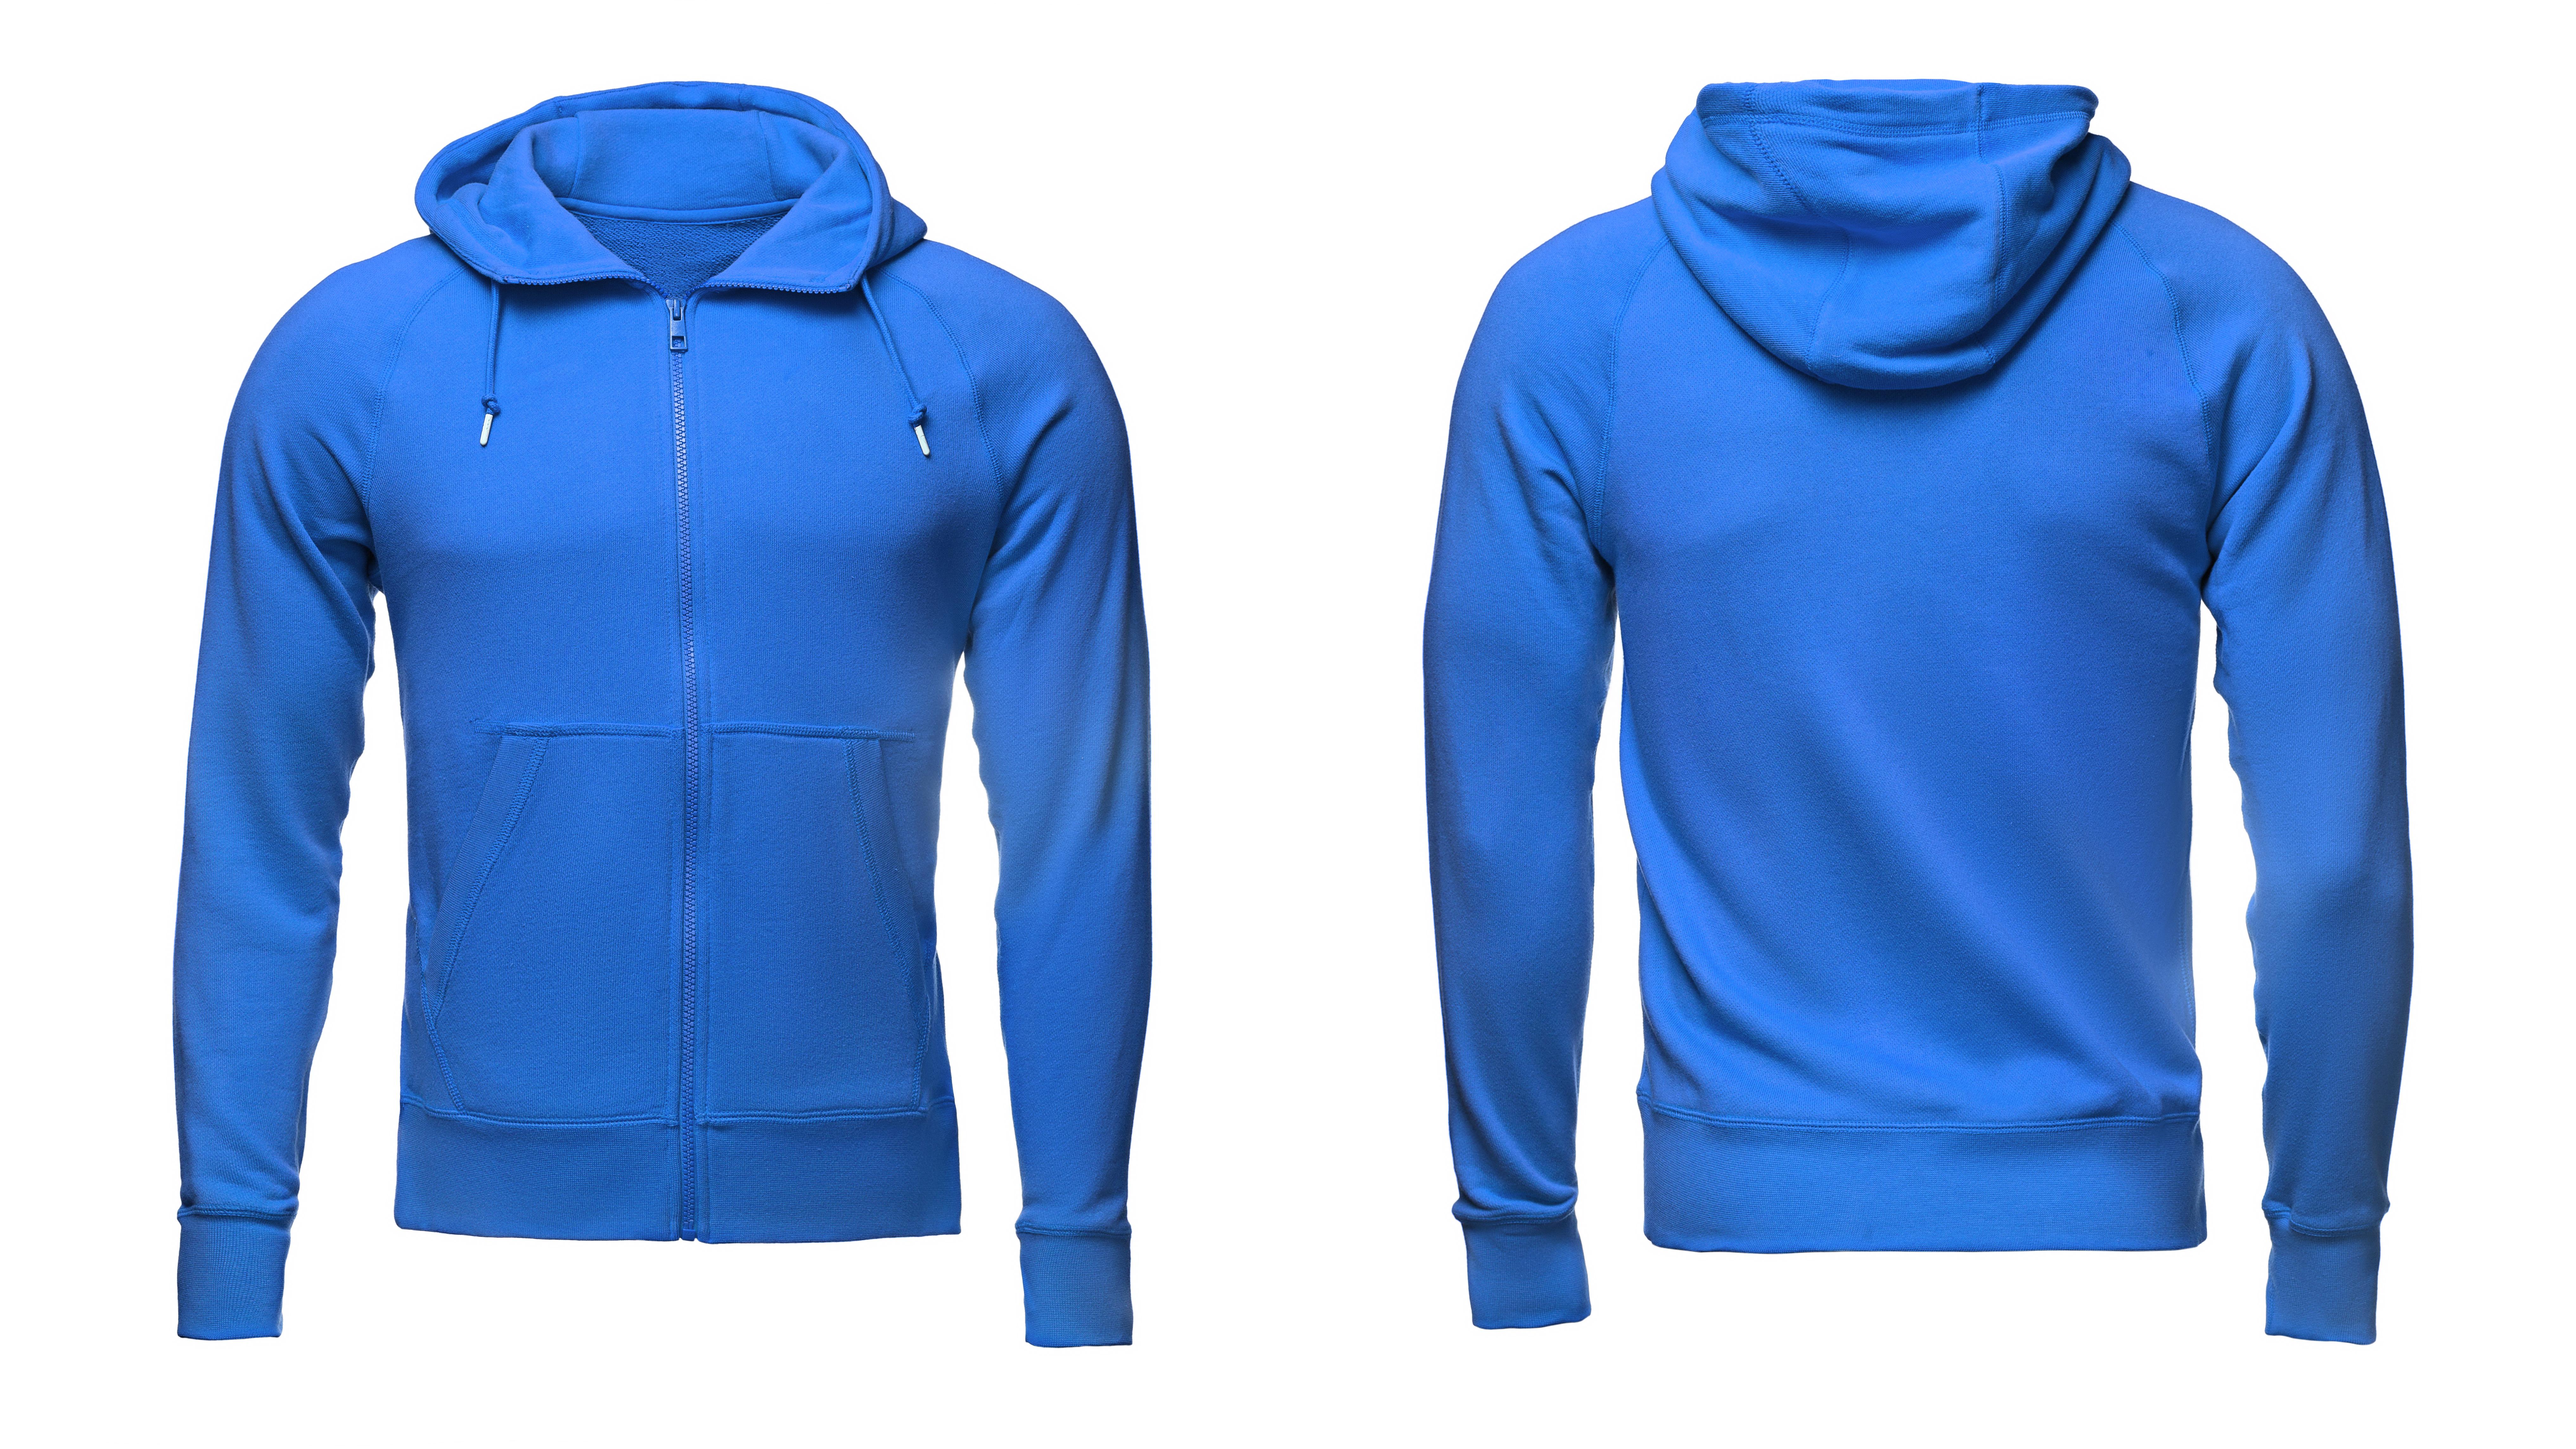 Custom made sweatshirts with hood (10)